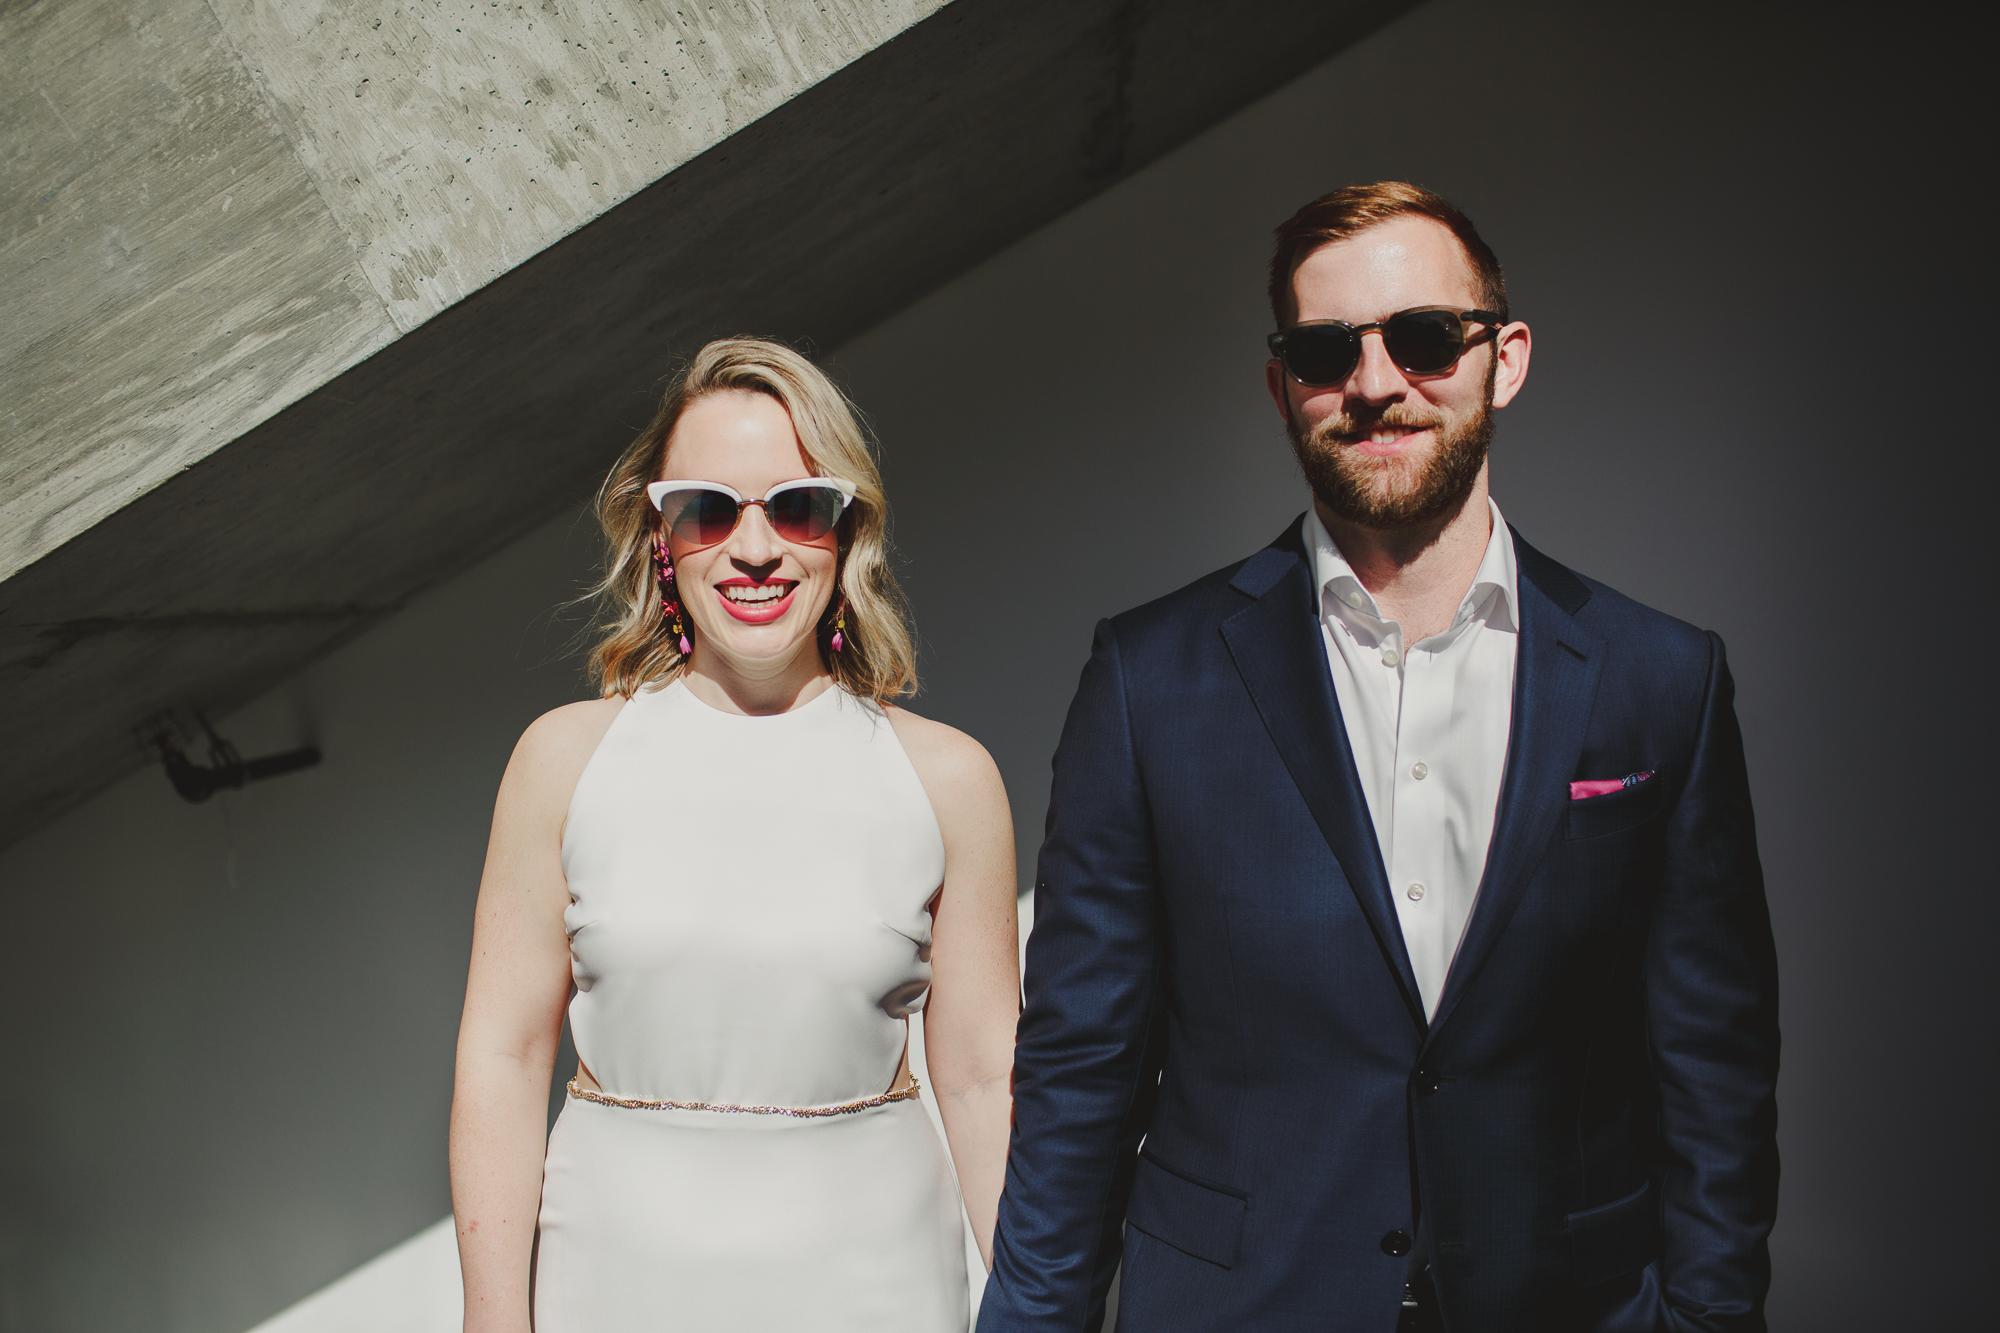 canvas event space wedding photos by Krista Welch-0031.jpg